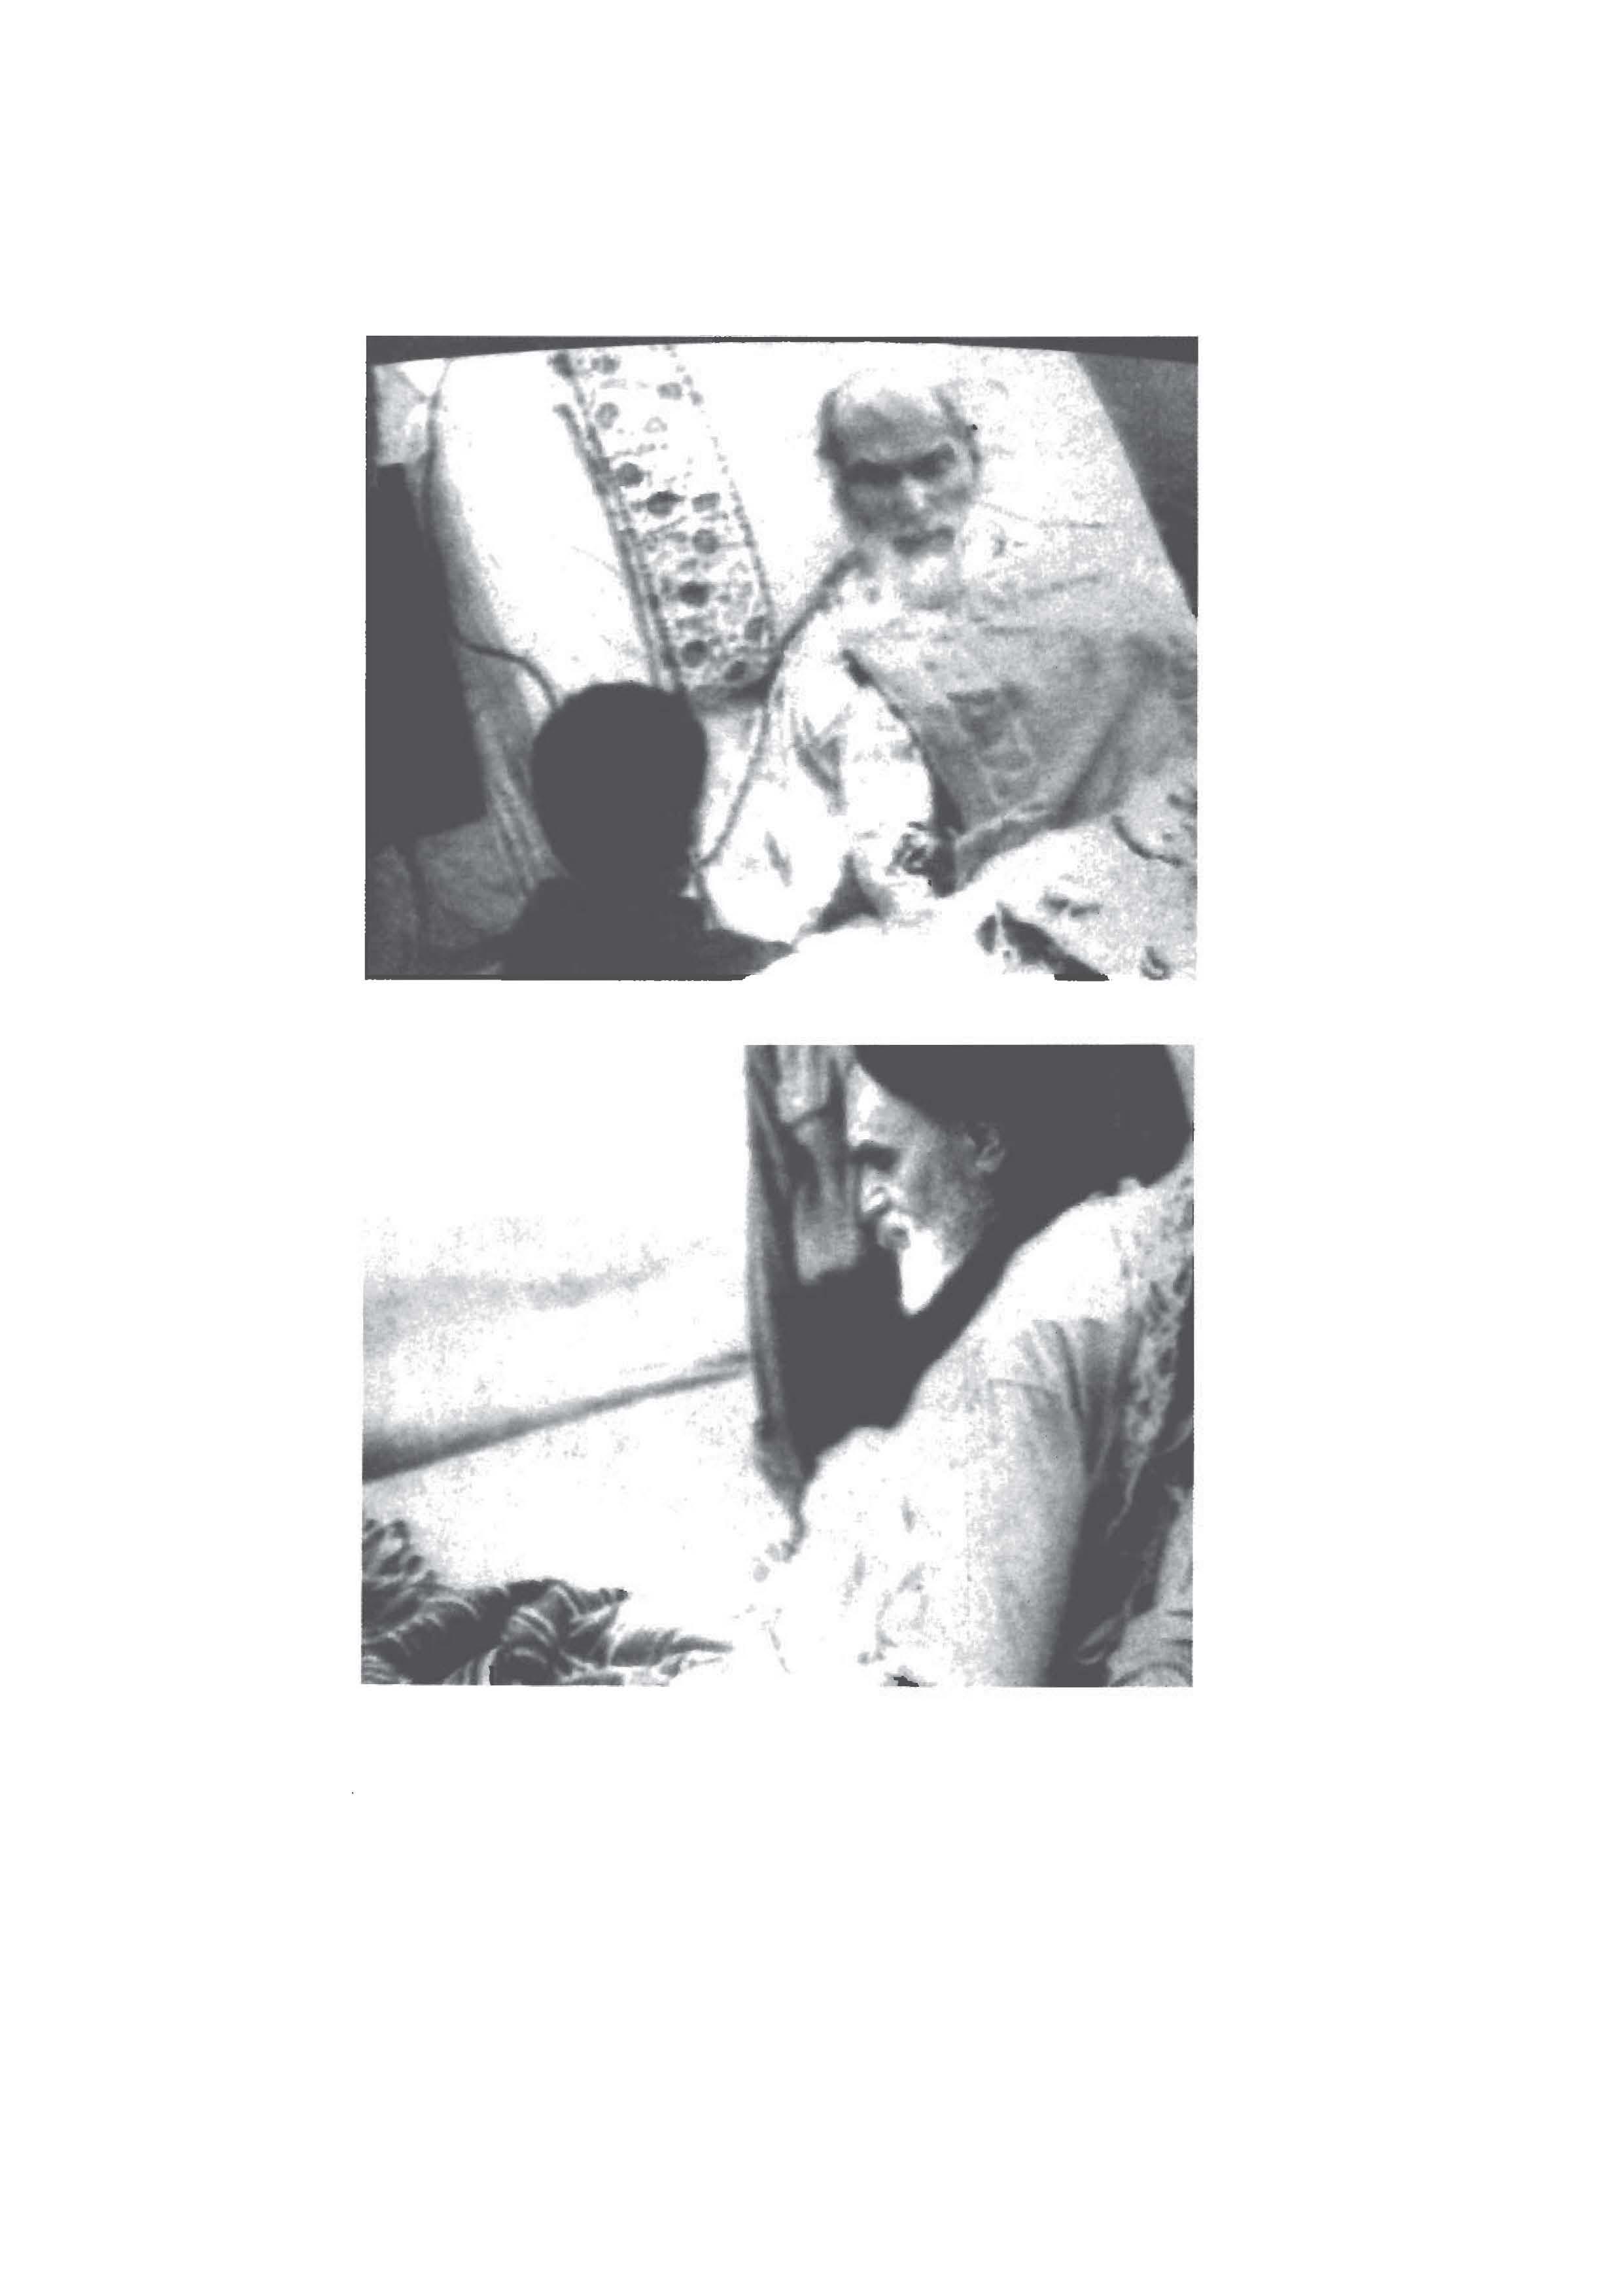 F:\f.khosravi\خاطرات\خاطرات فایل اصلی\150-fasle-sabr-kha-3-per\Pages from 150-Fasl sabr-khaterati az iyyame bimari -a4_Page_4.jpg